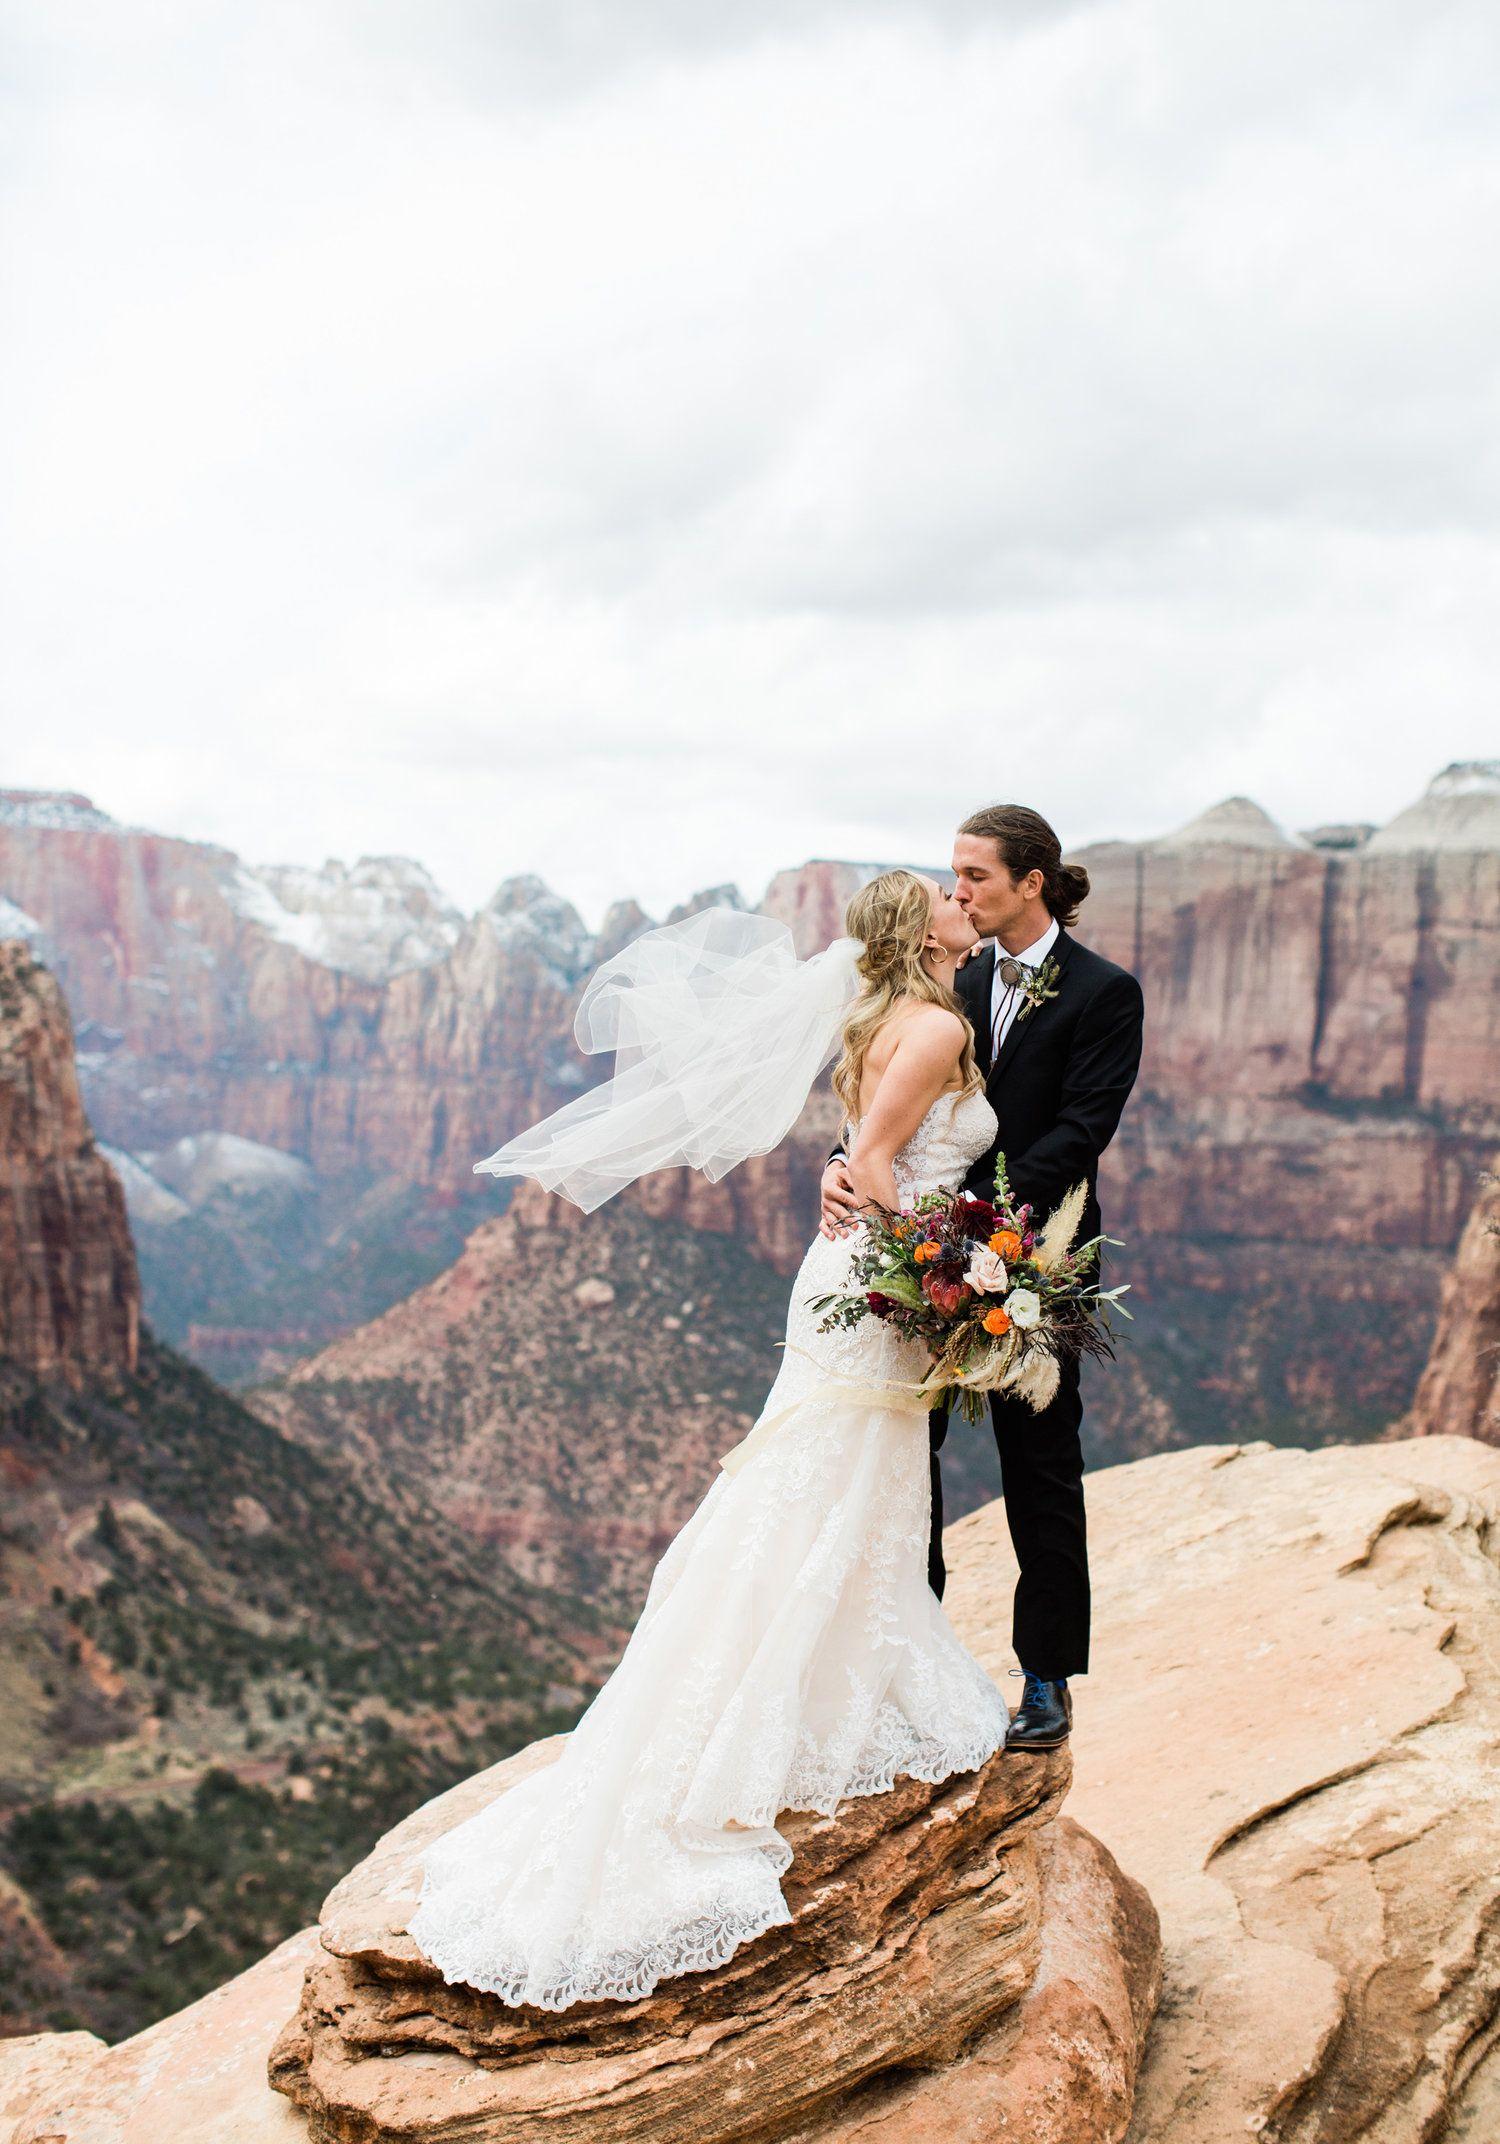 Zion National Park Wedding Photographer M Felt Photography National Park Wedding Park Weddings Zion National Park Photography